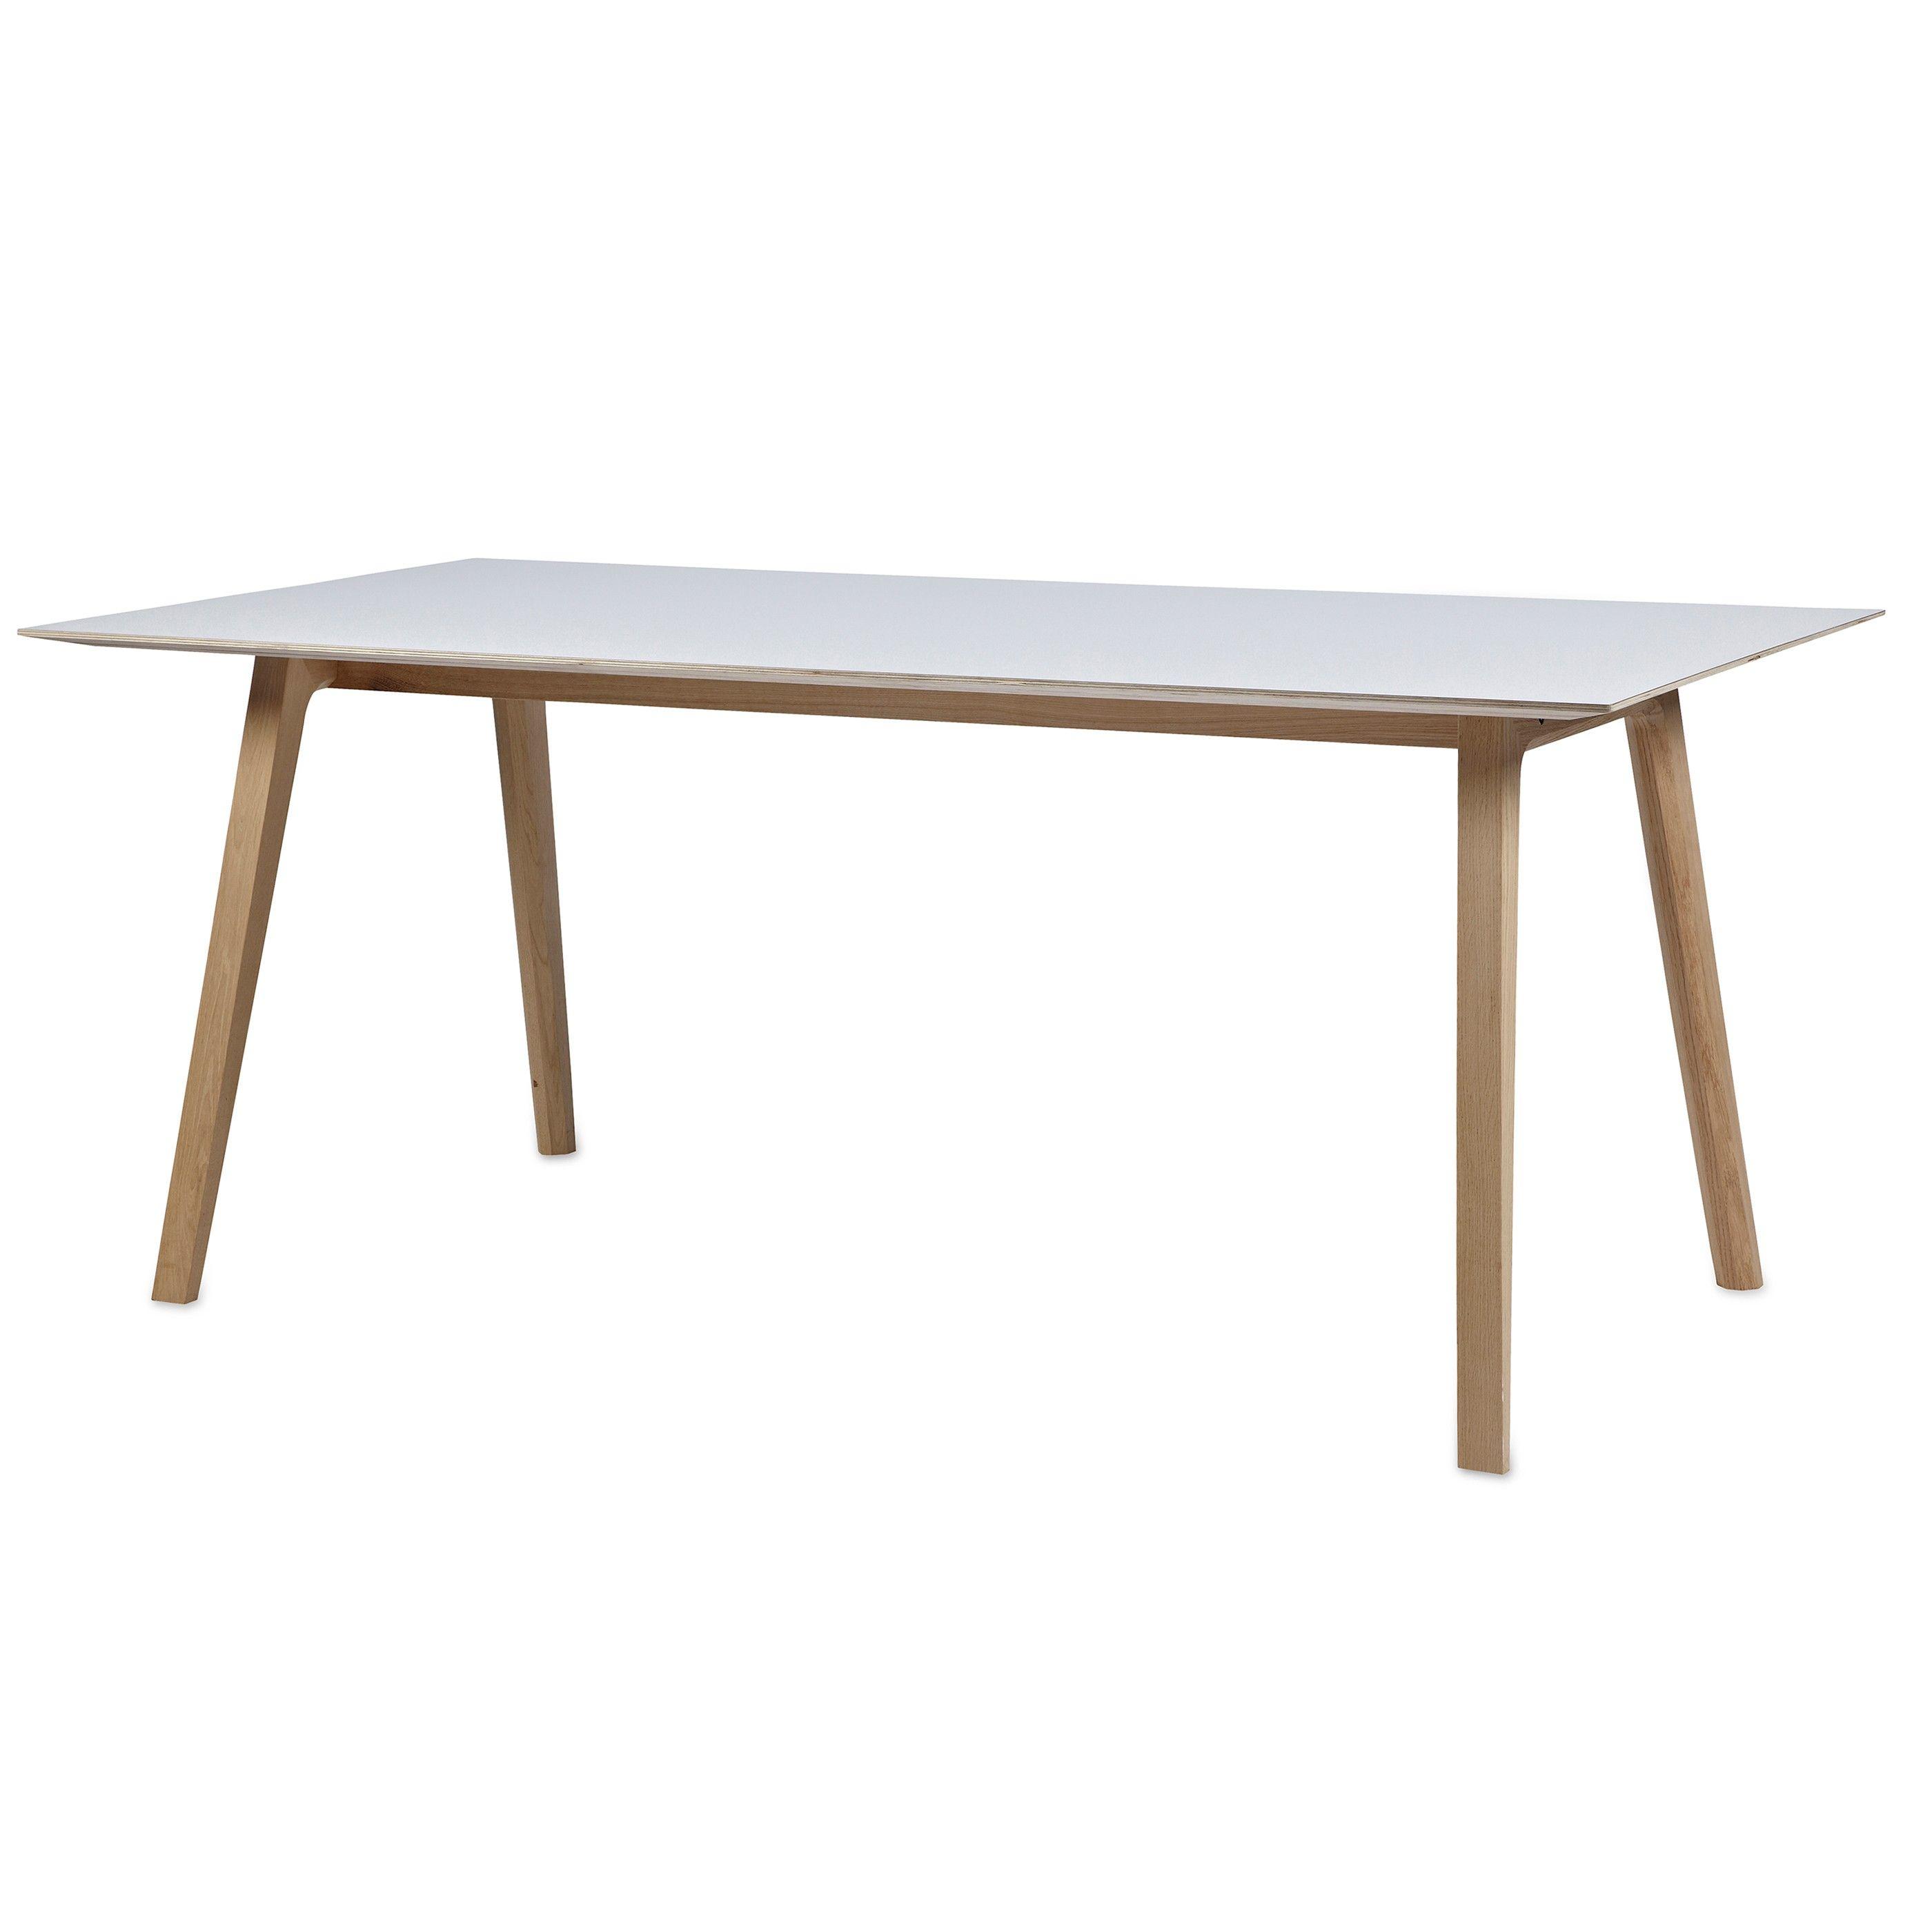 Bella Desk Tafel | Hay; Verkrijgbare Lengtes 180 En 240; Tafelblad Wit  Laminaat Of